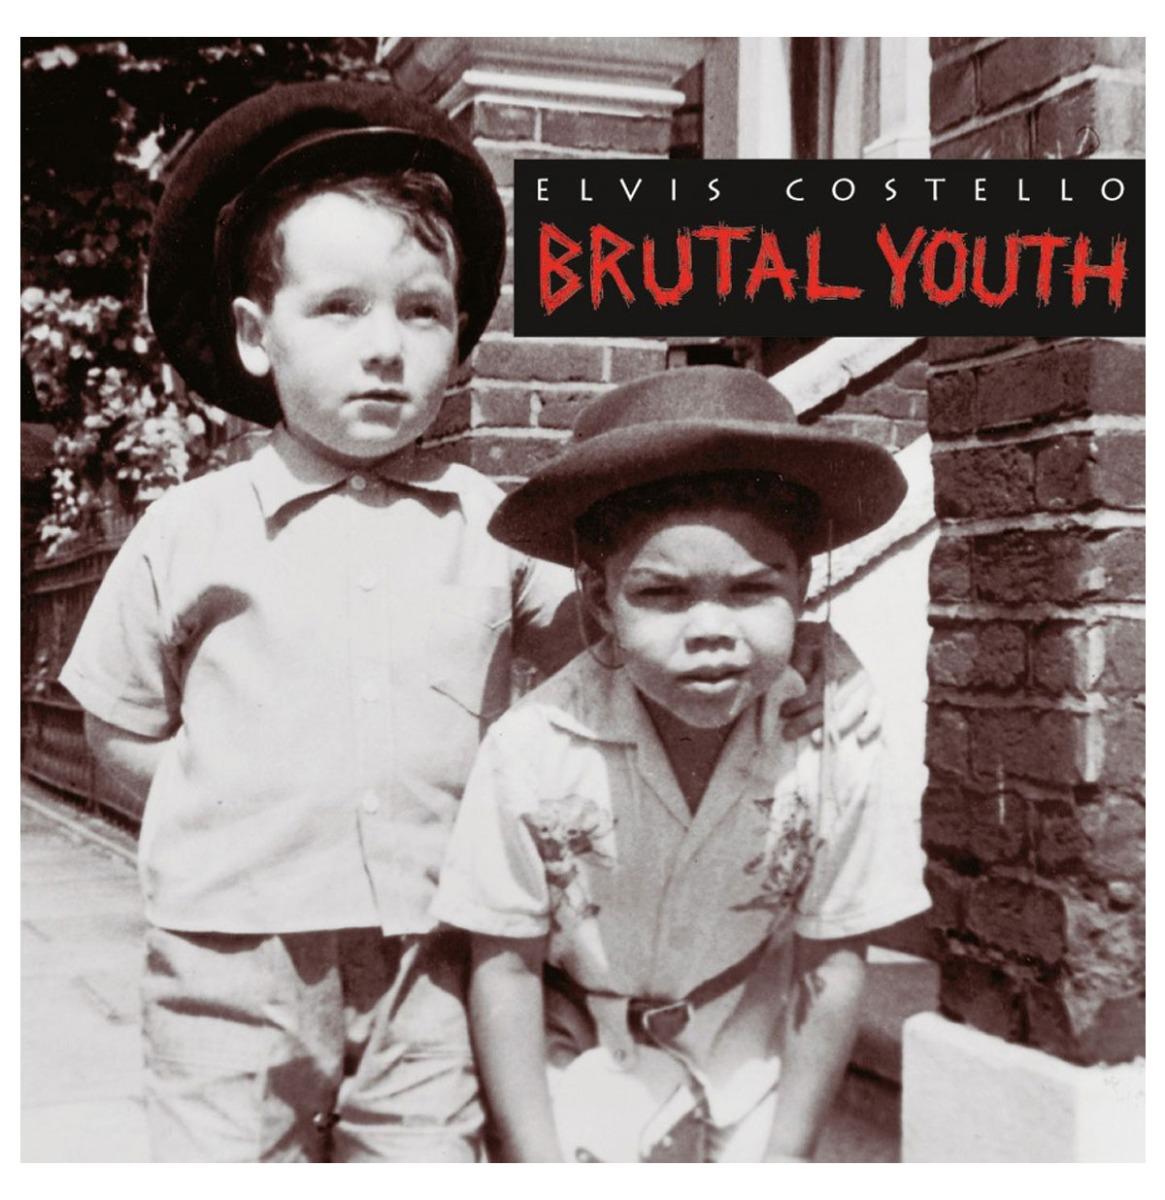 Elvis Costello - Brutal Youth 2-LP Beperkte Oplage